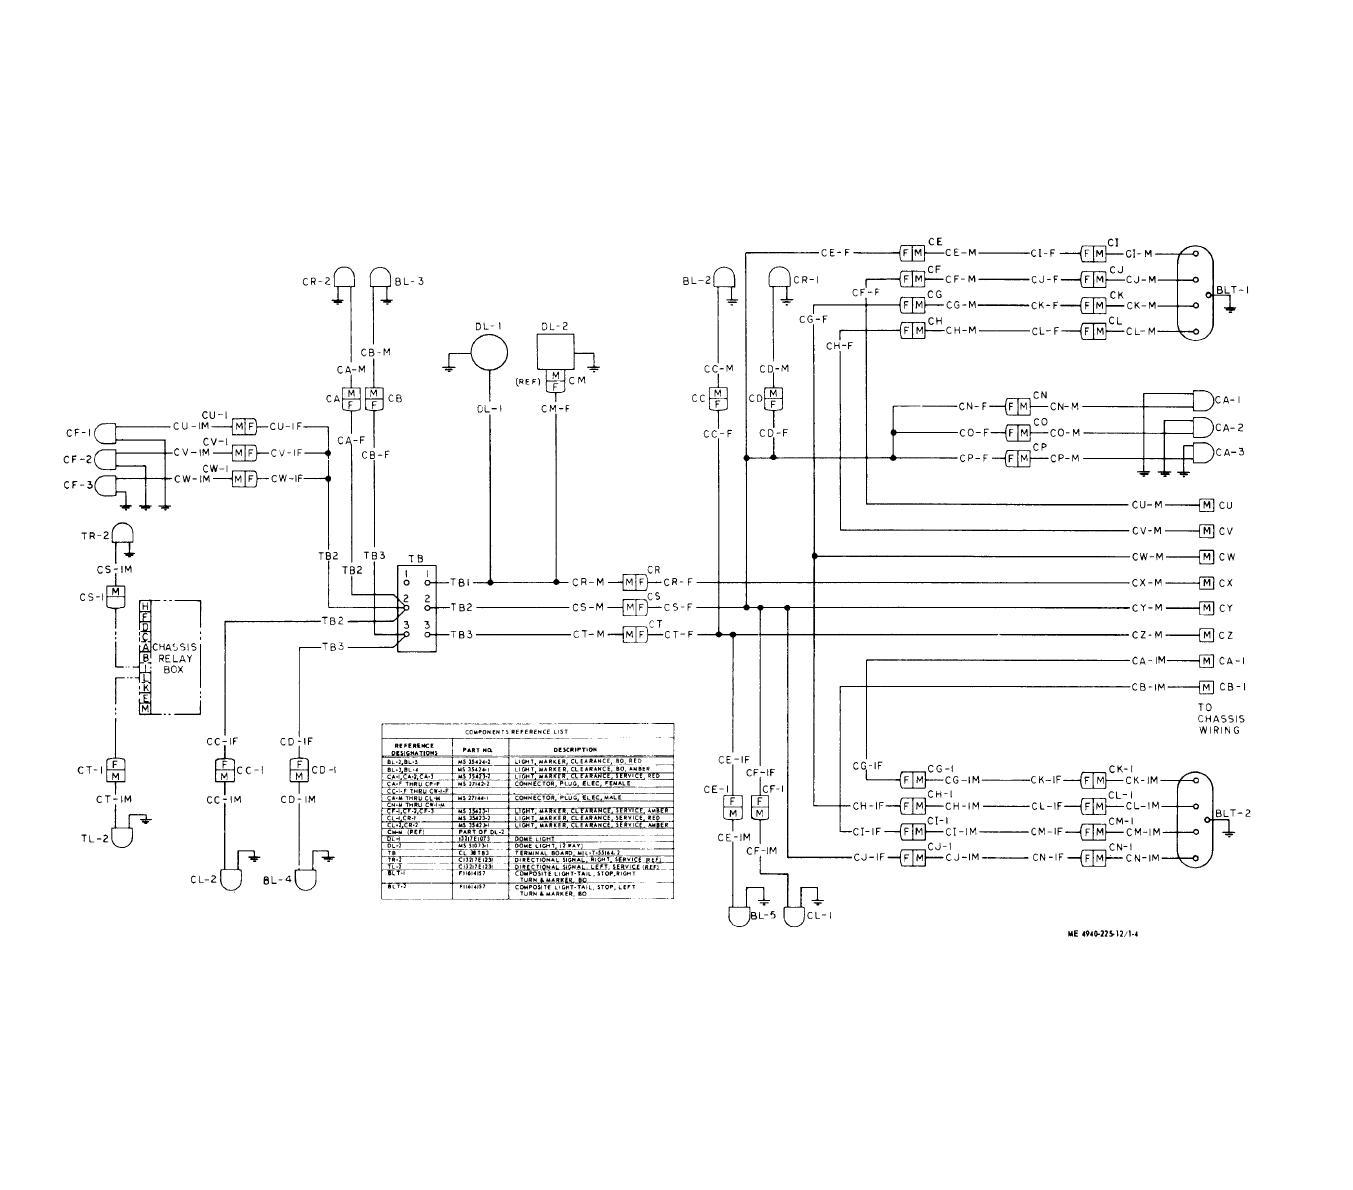 ... 4020 john deere wiring diagram for free get free image 1966 John Deere  4020 24 Volt